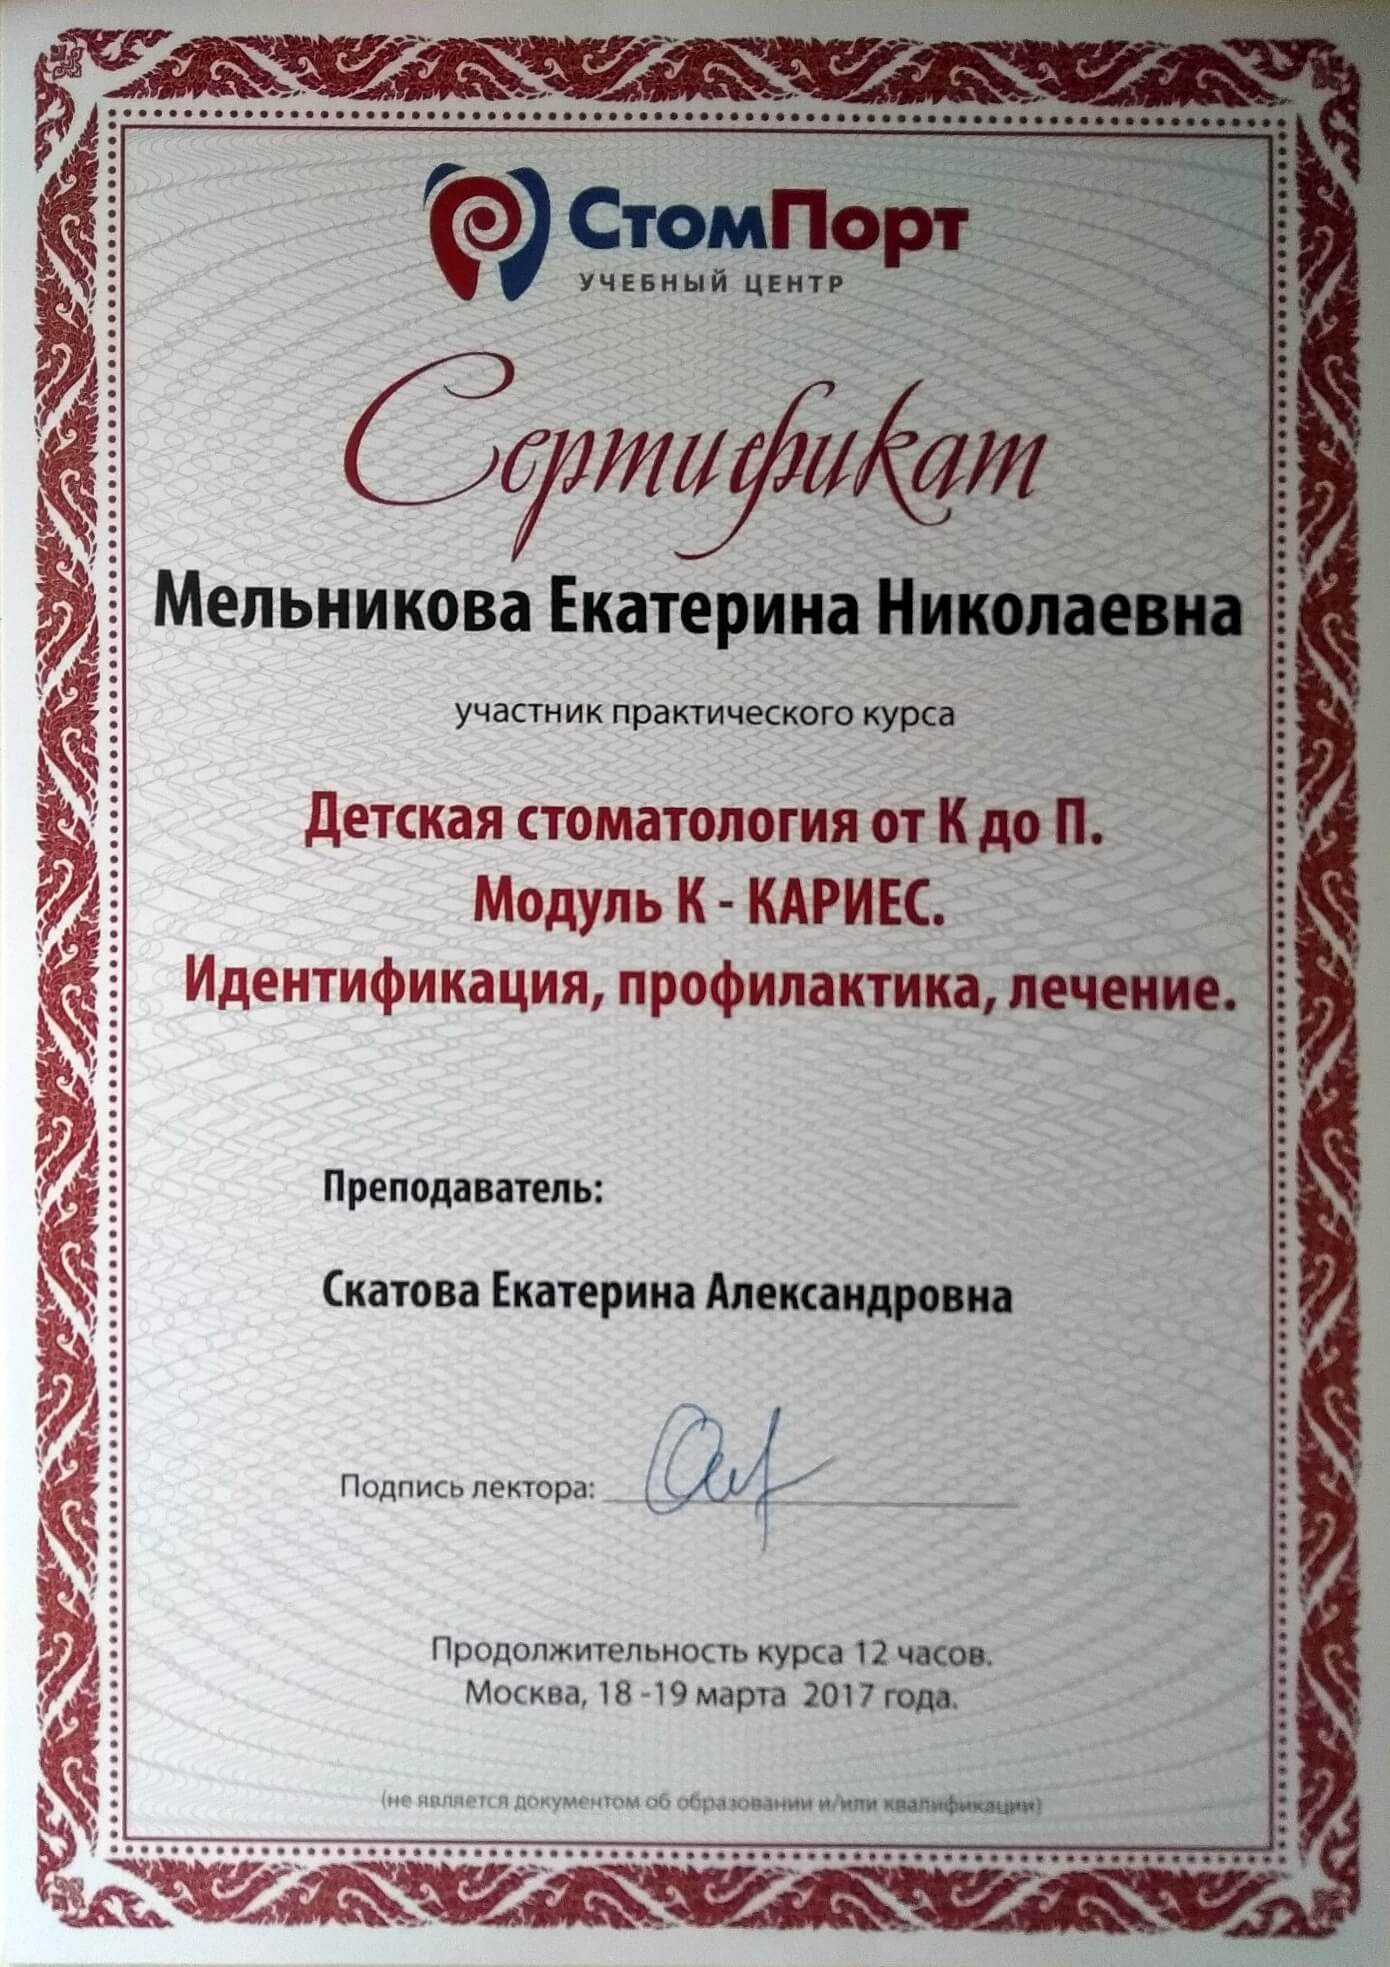 Куликова В. С. — сертификат №9